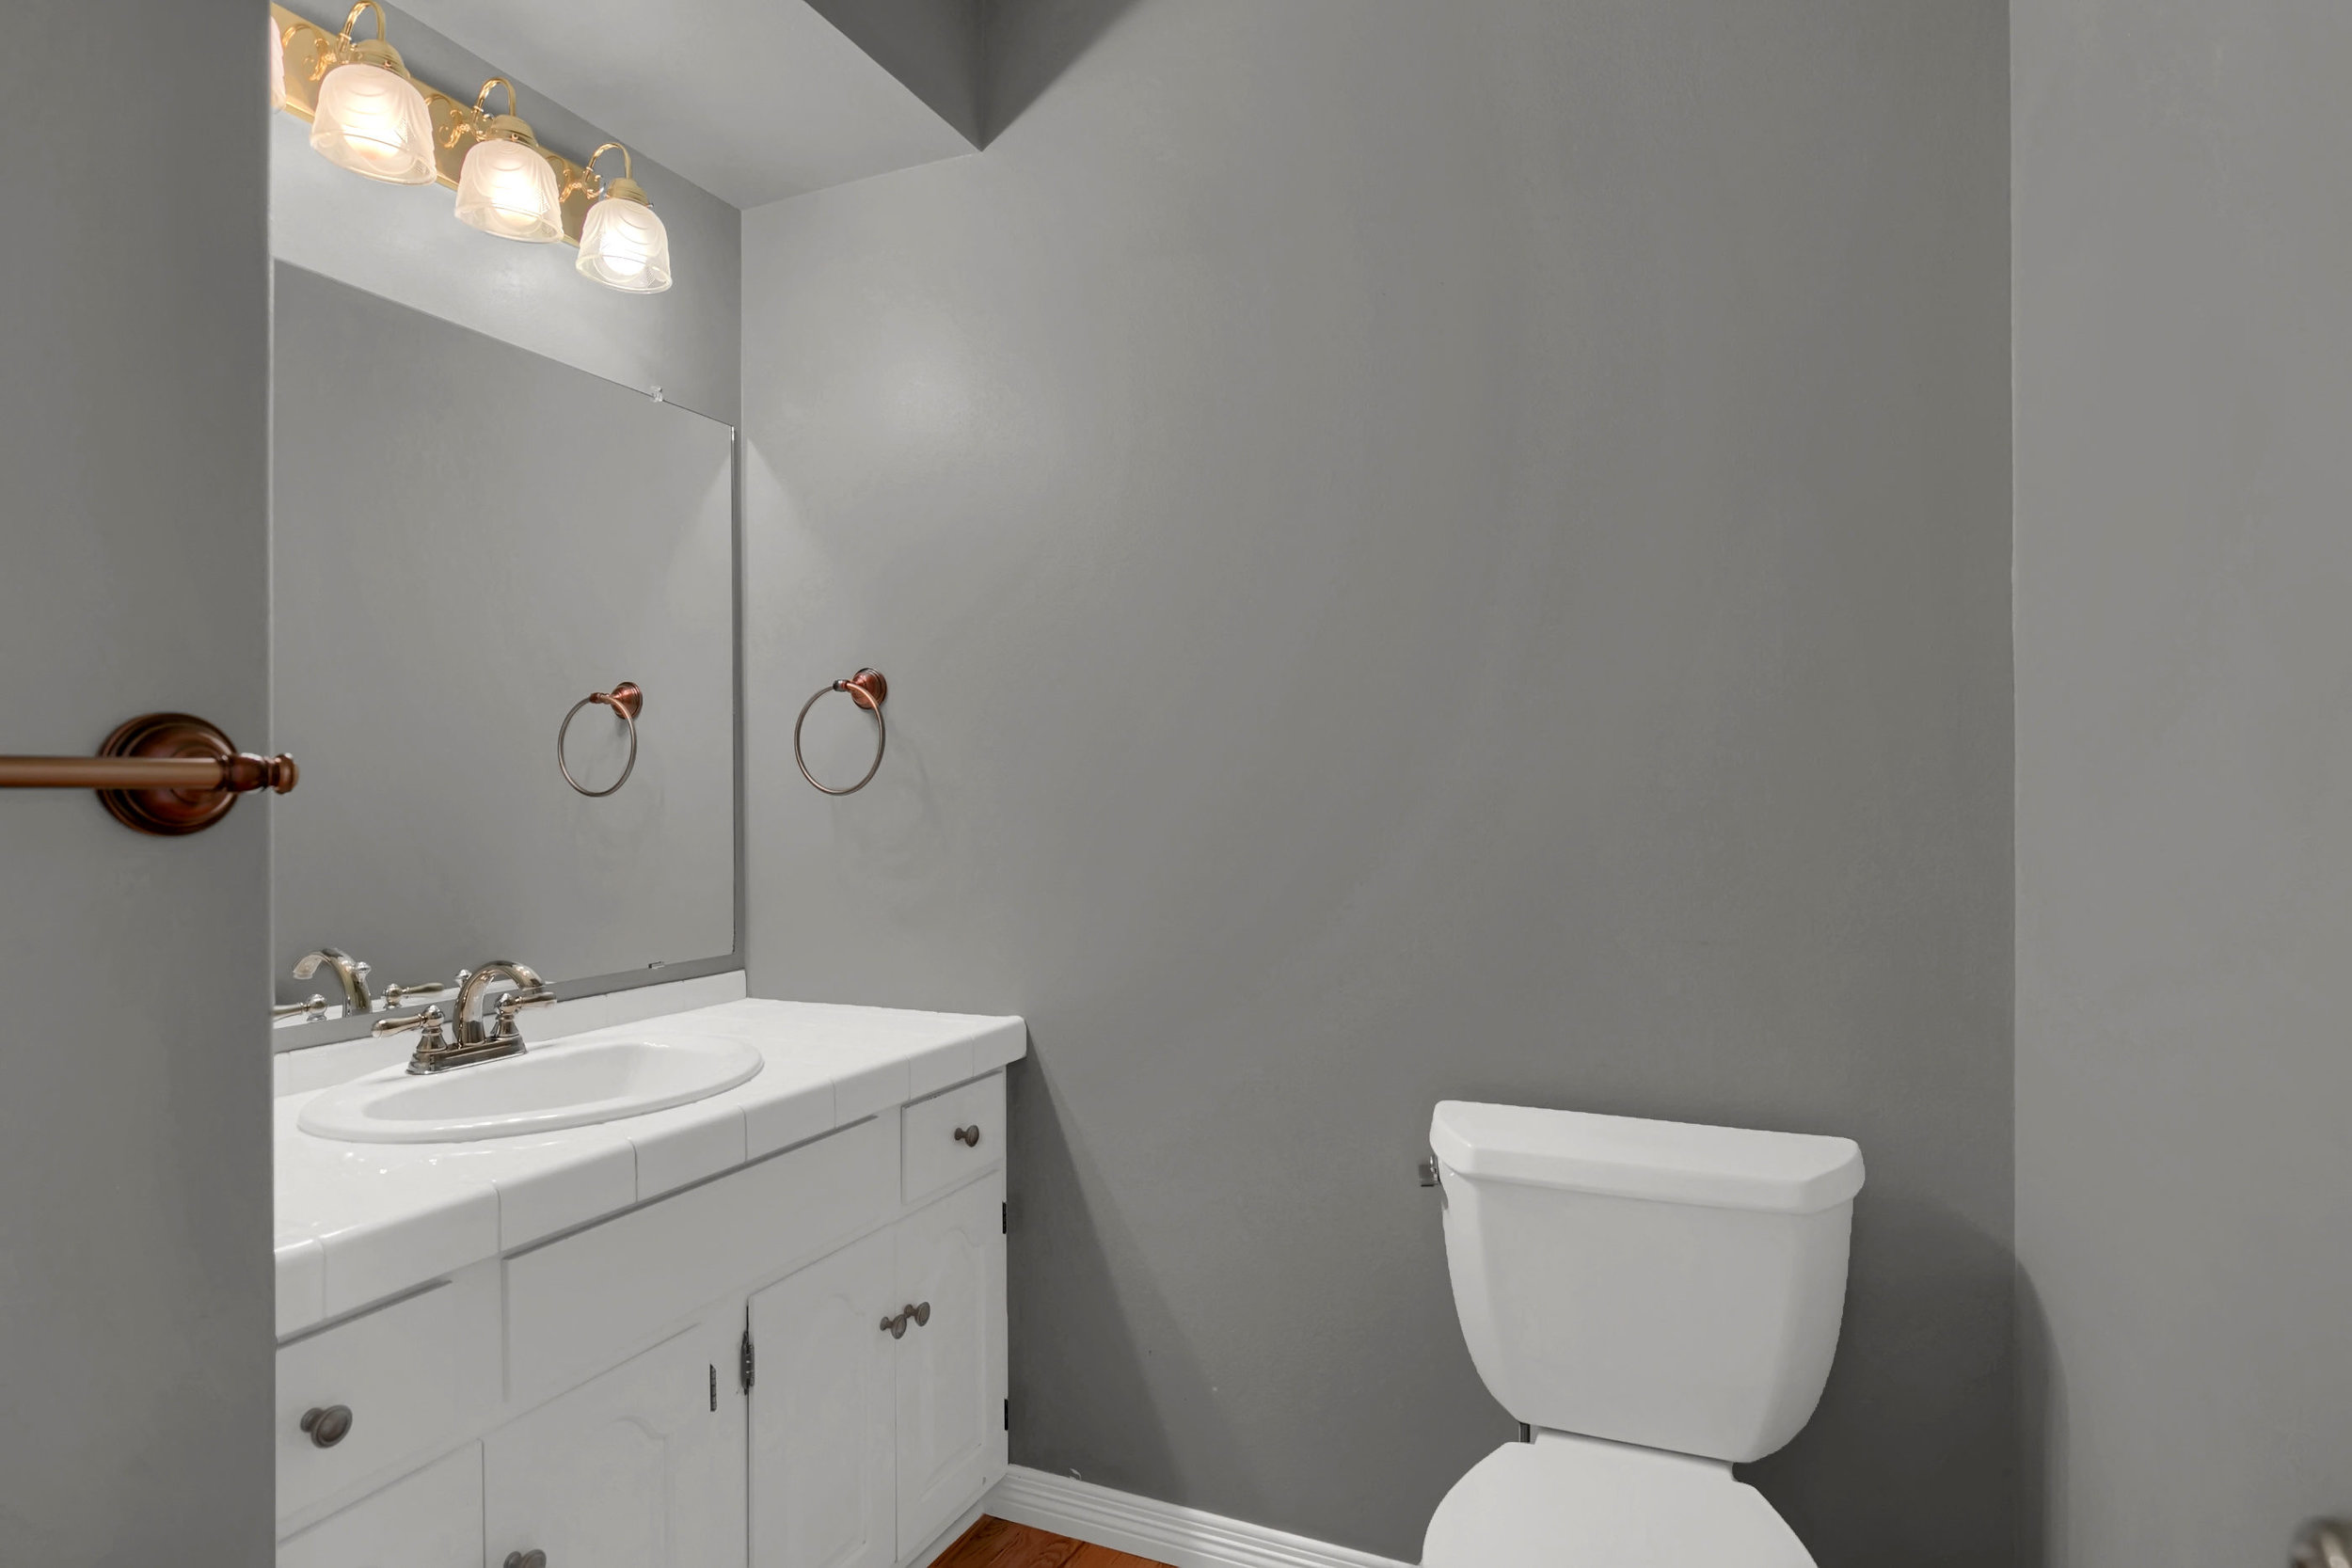 4215 Stonehaven Dr Colorado-print-023-019-Bathroom-2800x1867-300dpi.jpg